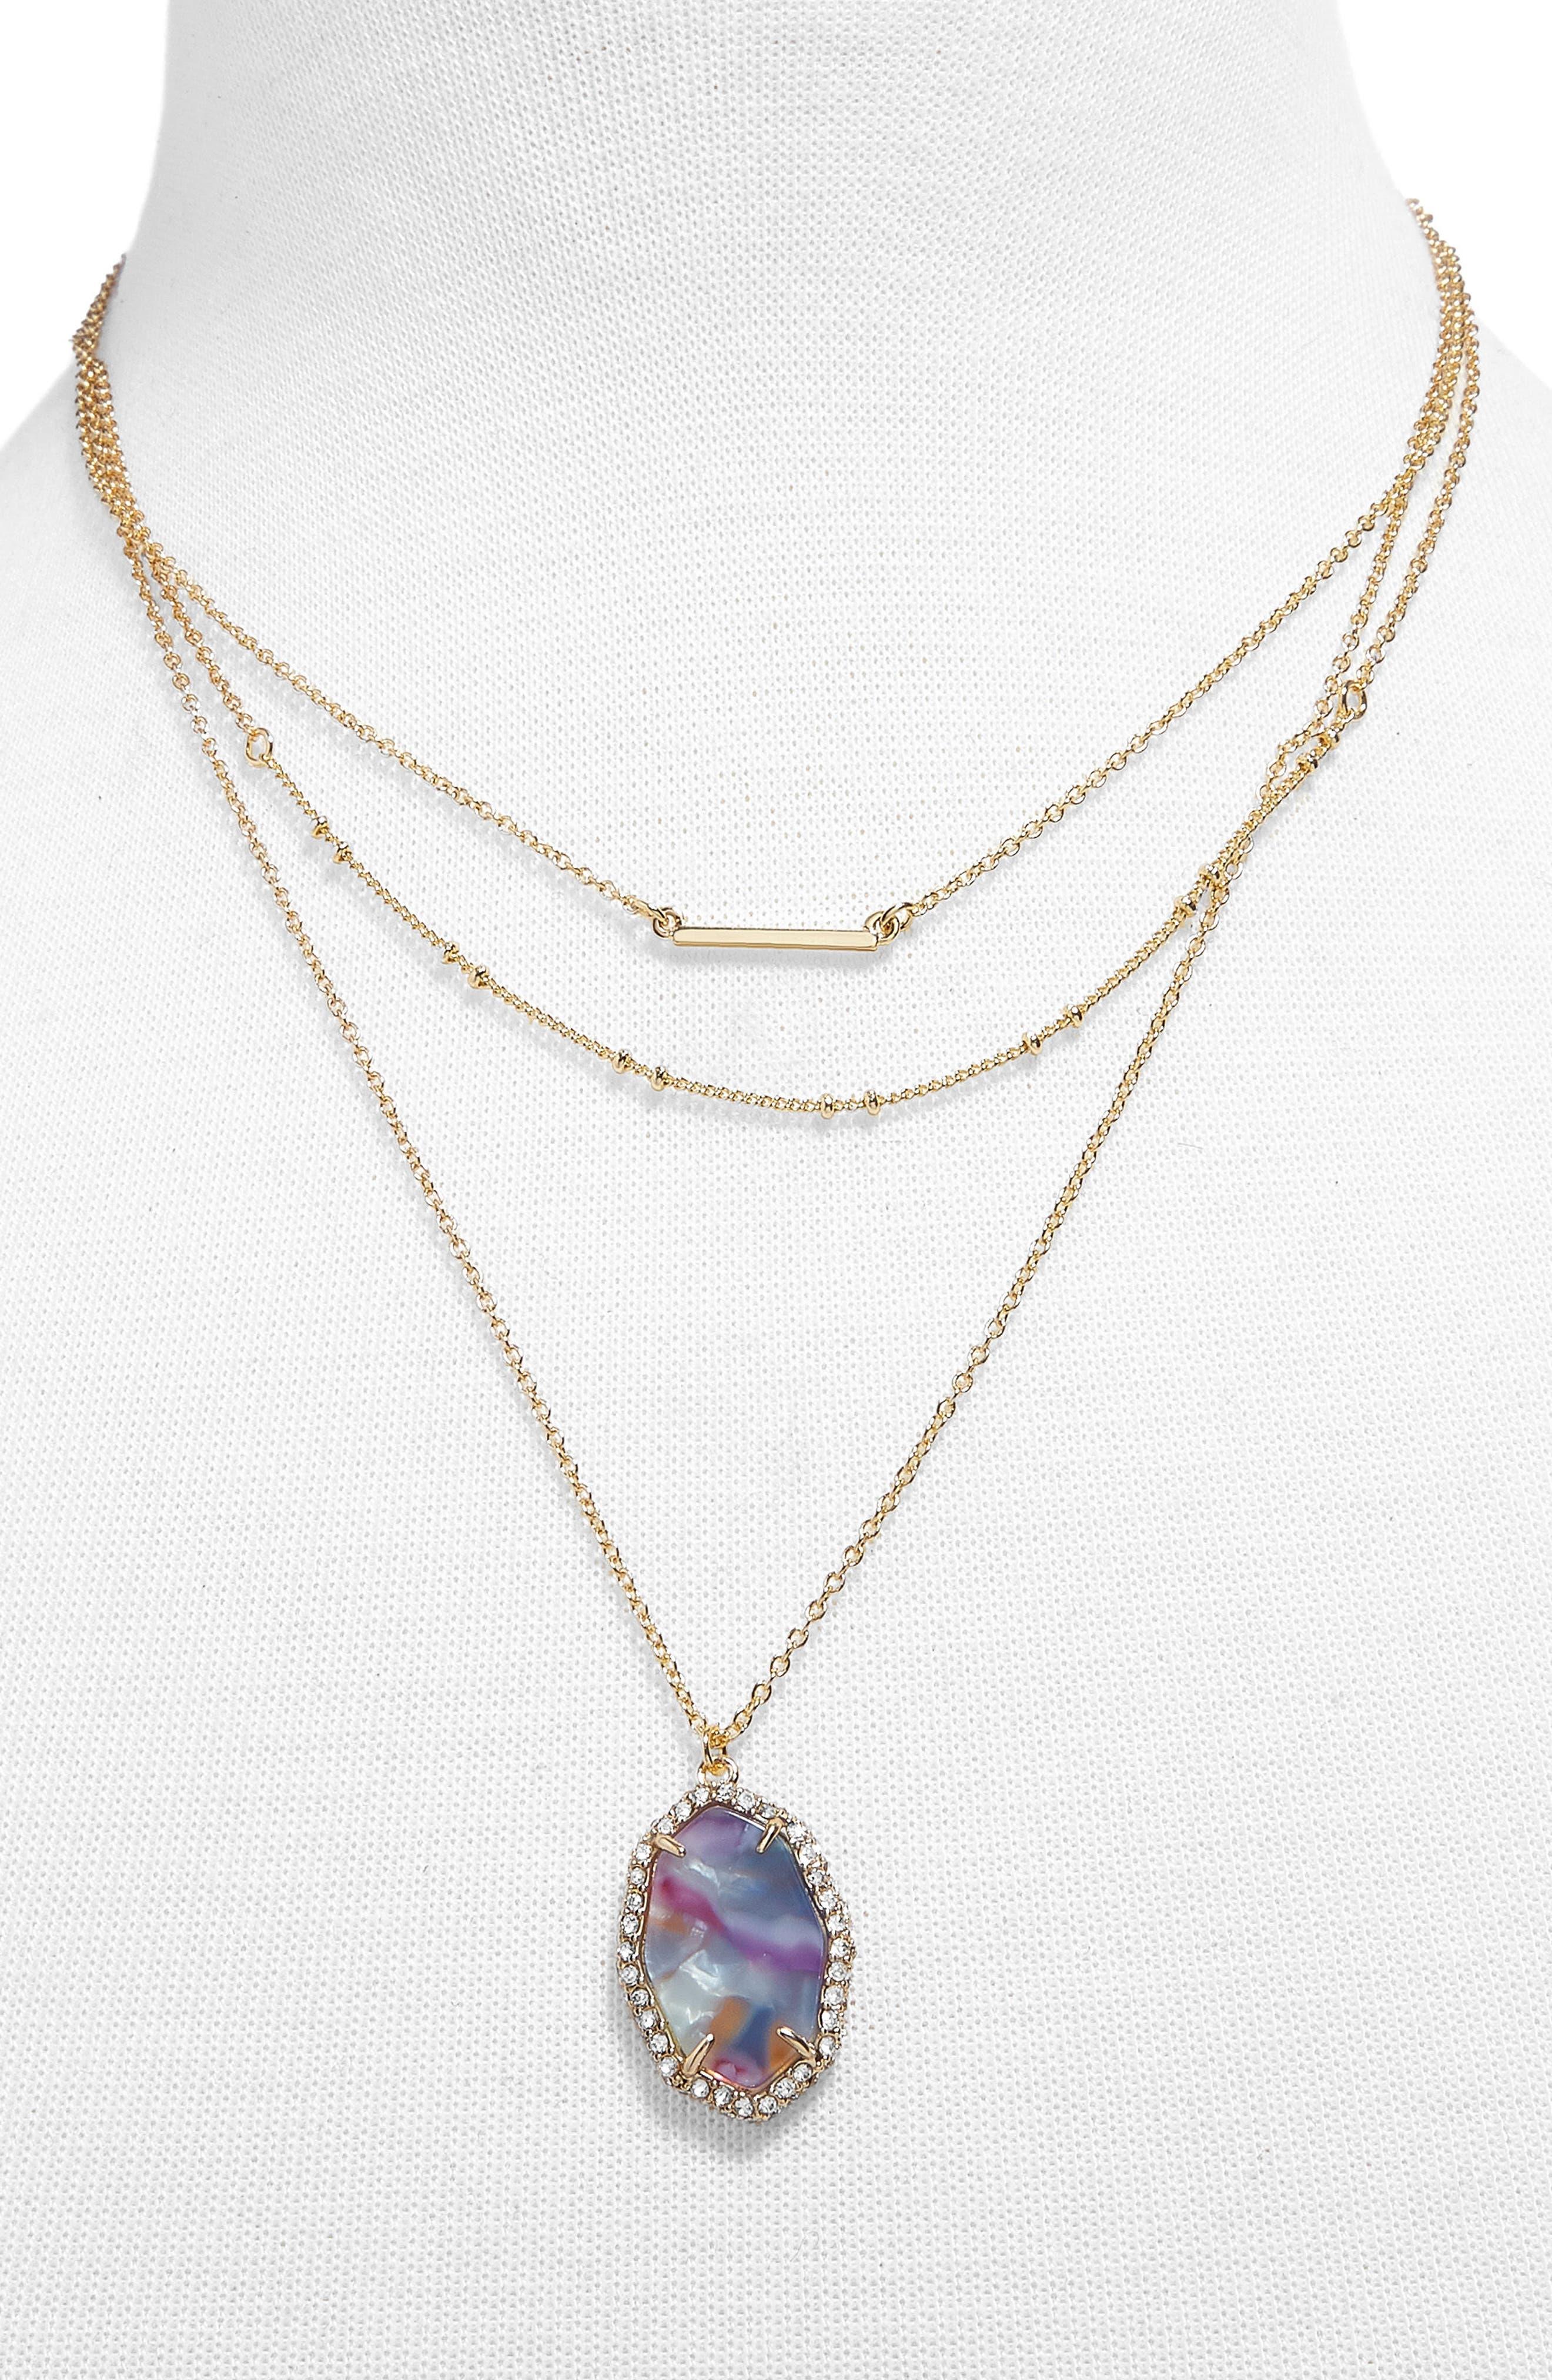 Ellory Layered Pendant Necklace,                             Main thumbnail 1, color,